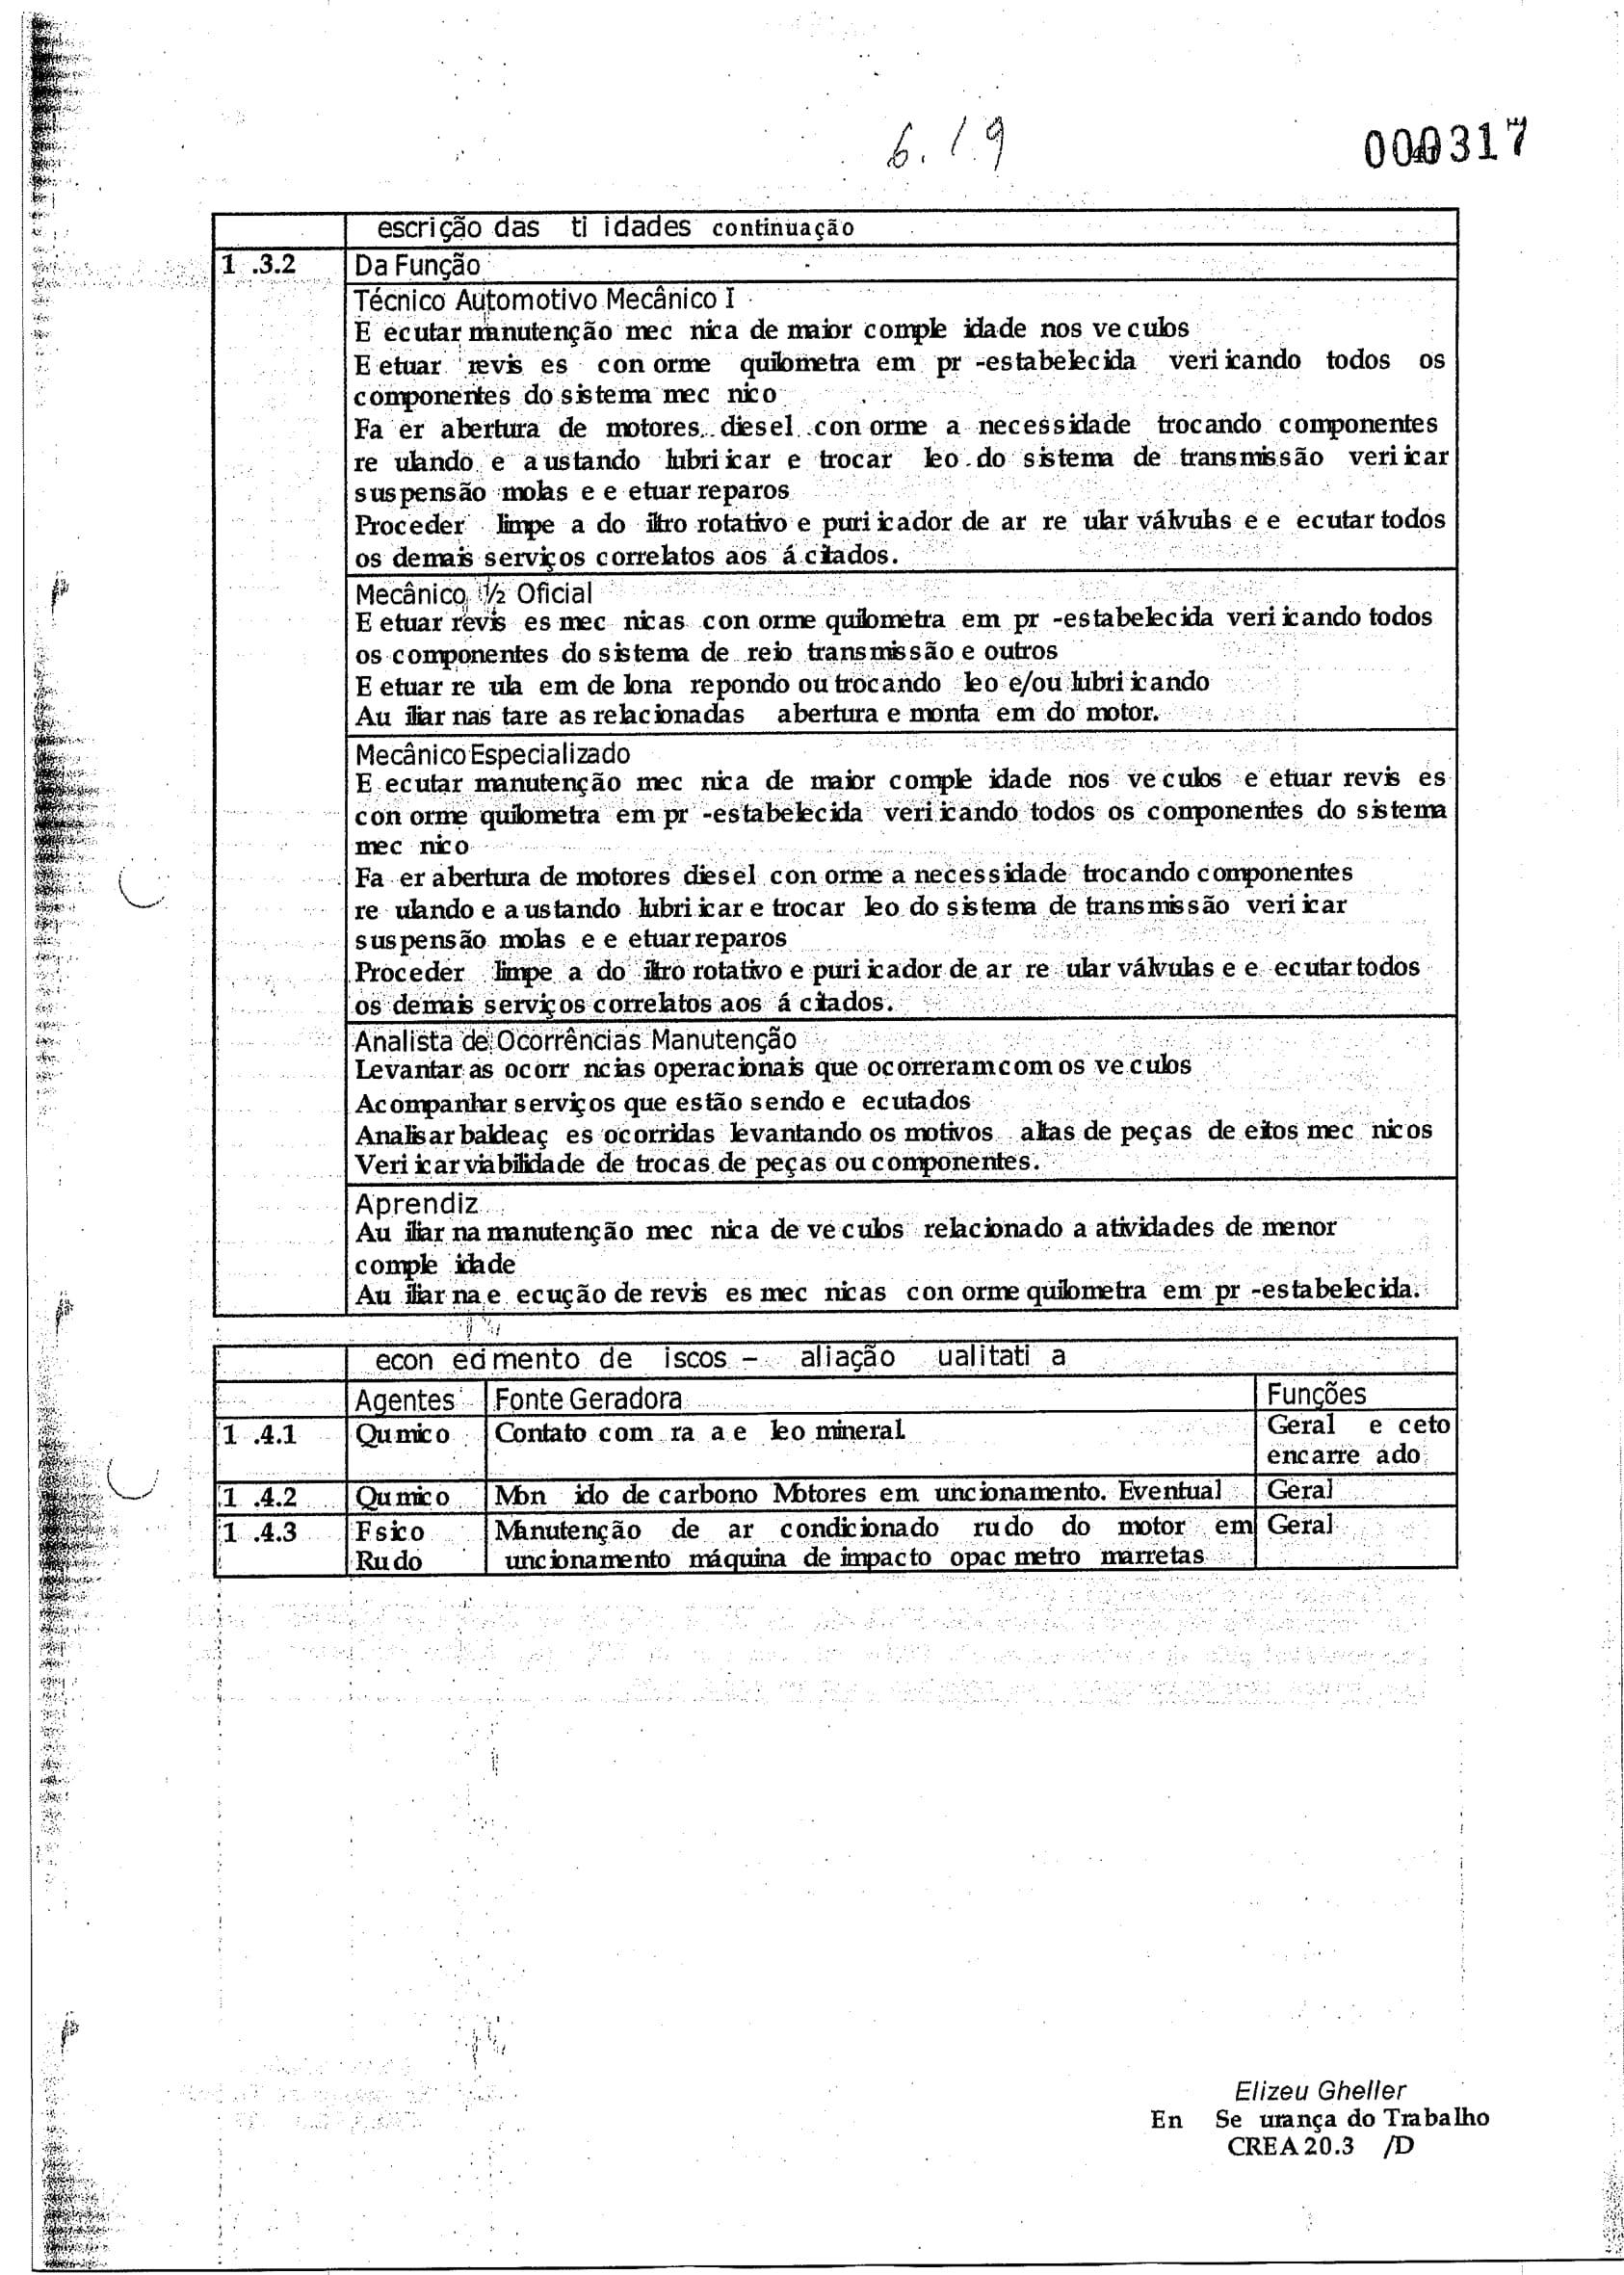 PL001222019-198